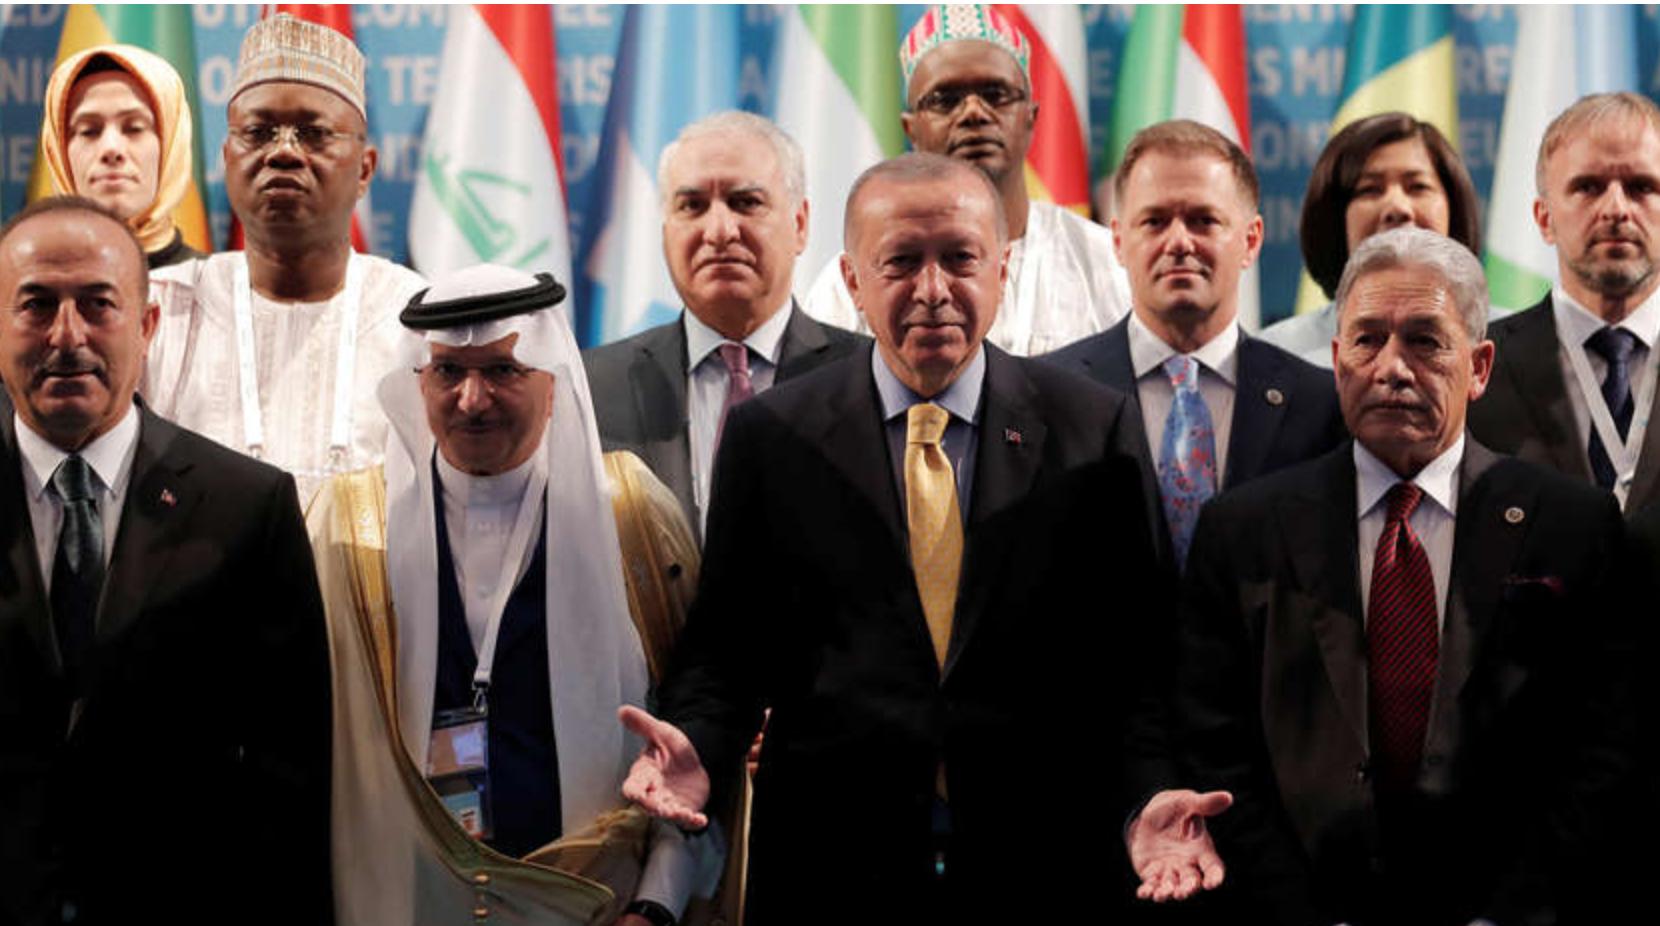 Intel: Why Turkey's transfer of Muslim bloc leadership to Saudis was so uncomfortable